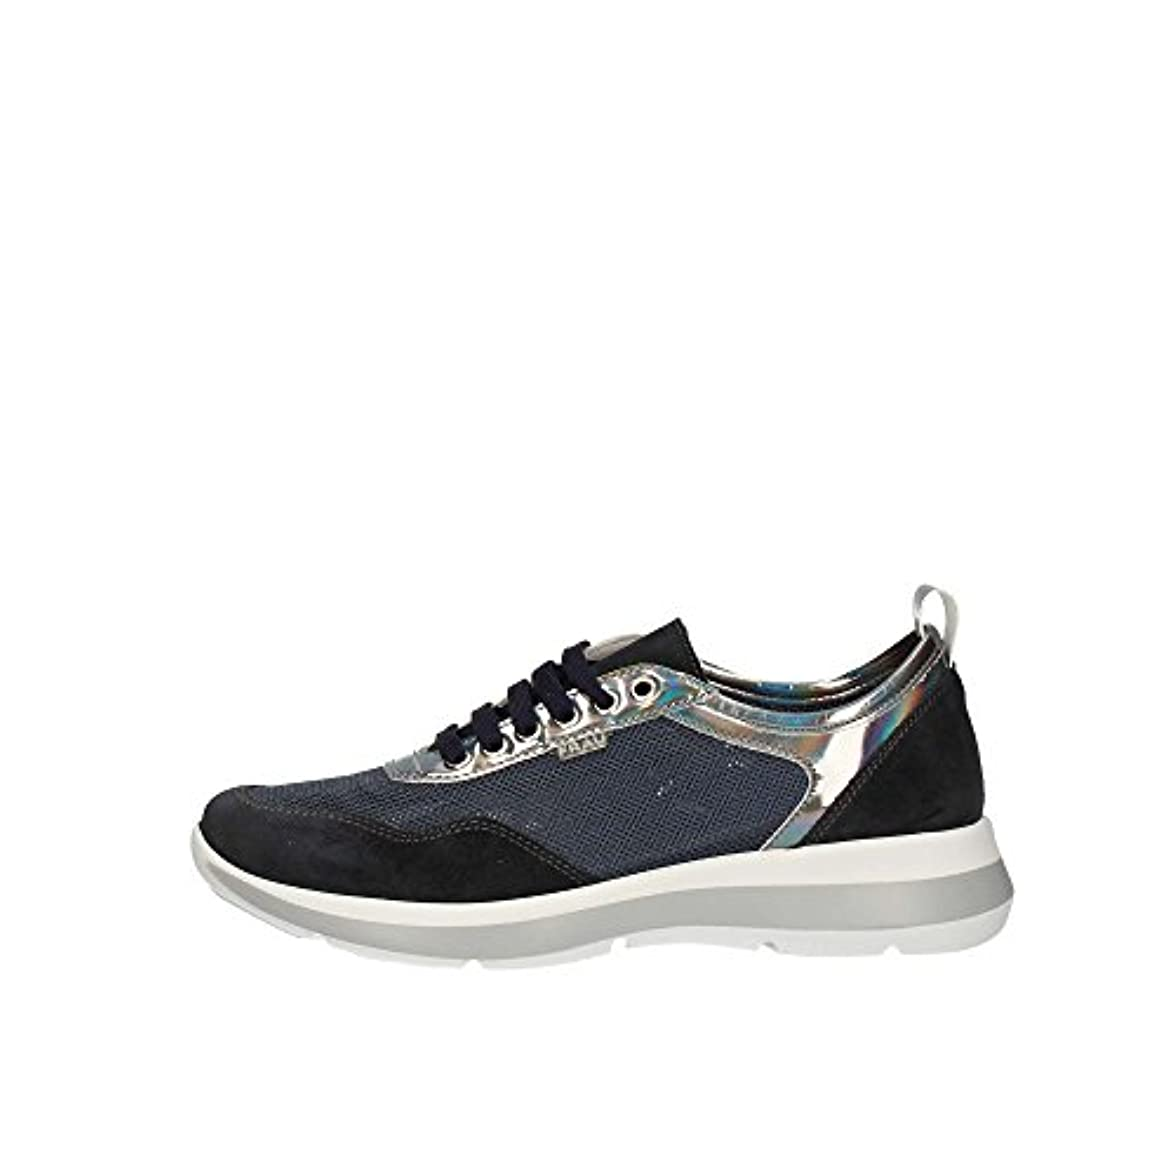 Frau 42e4 Sneakers Donna Blu 39